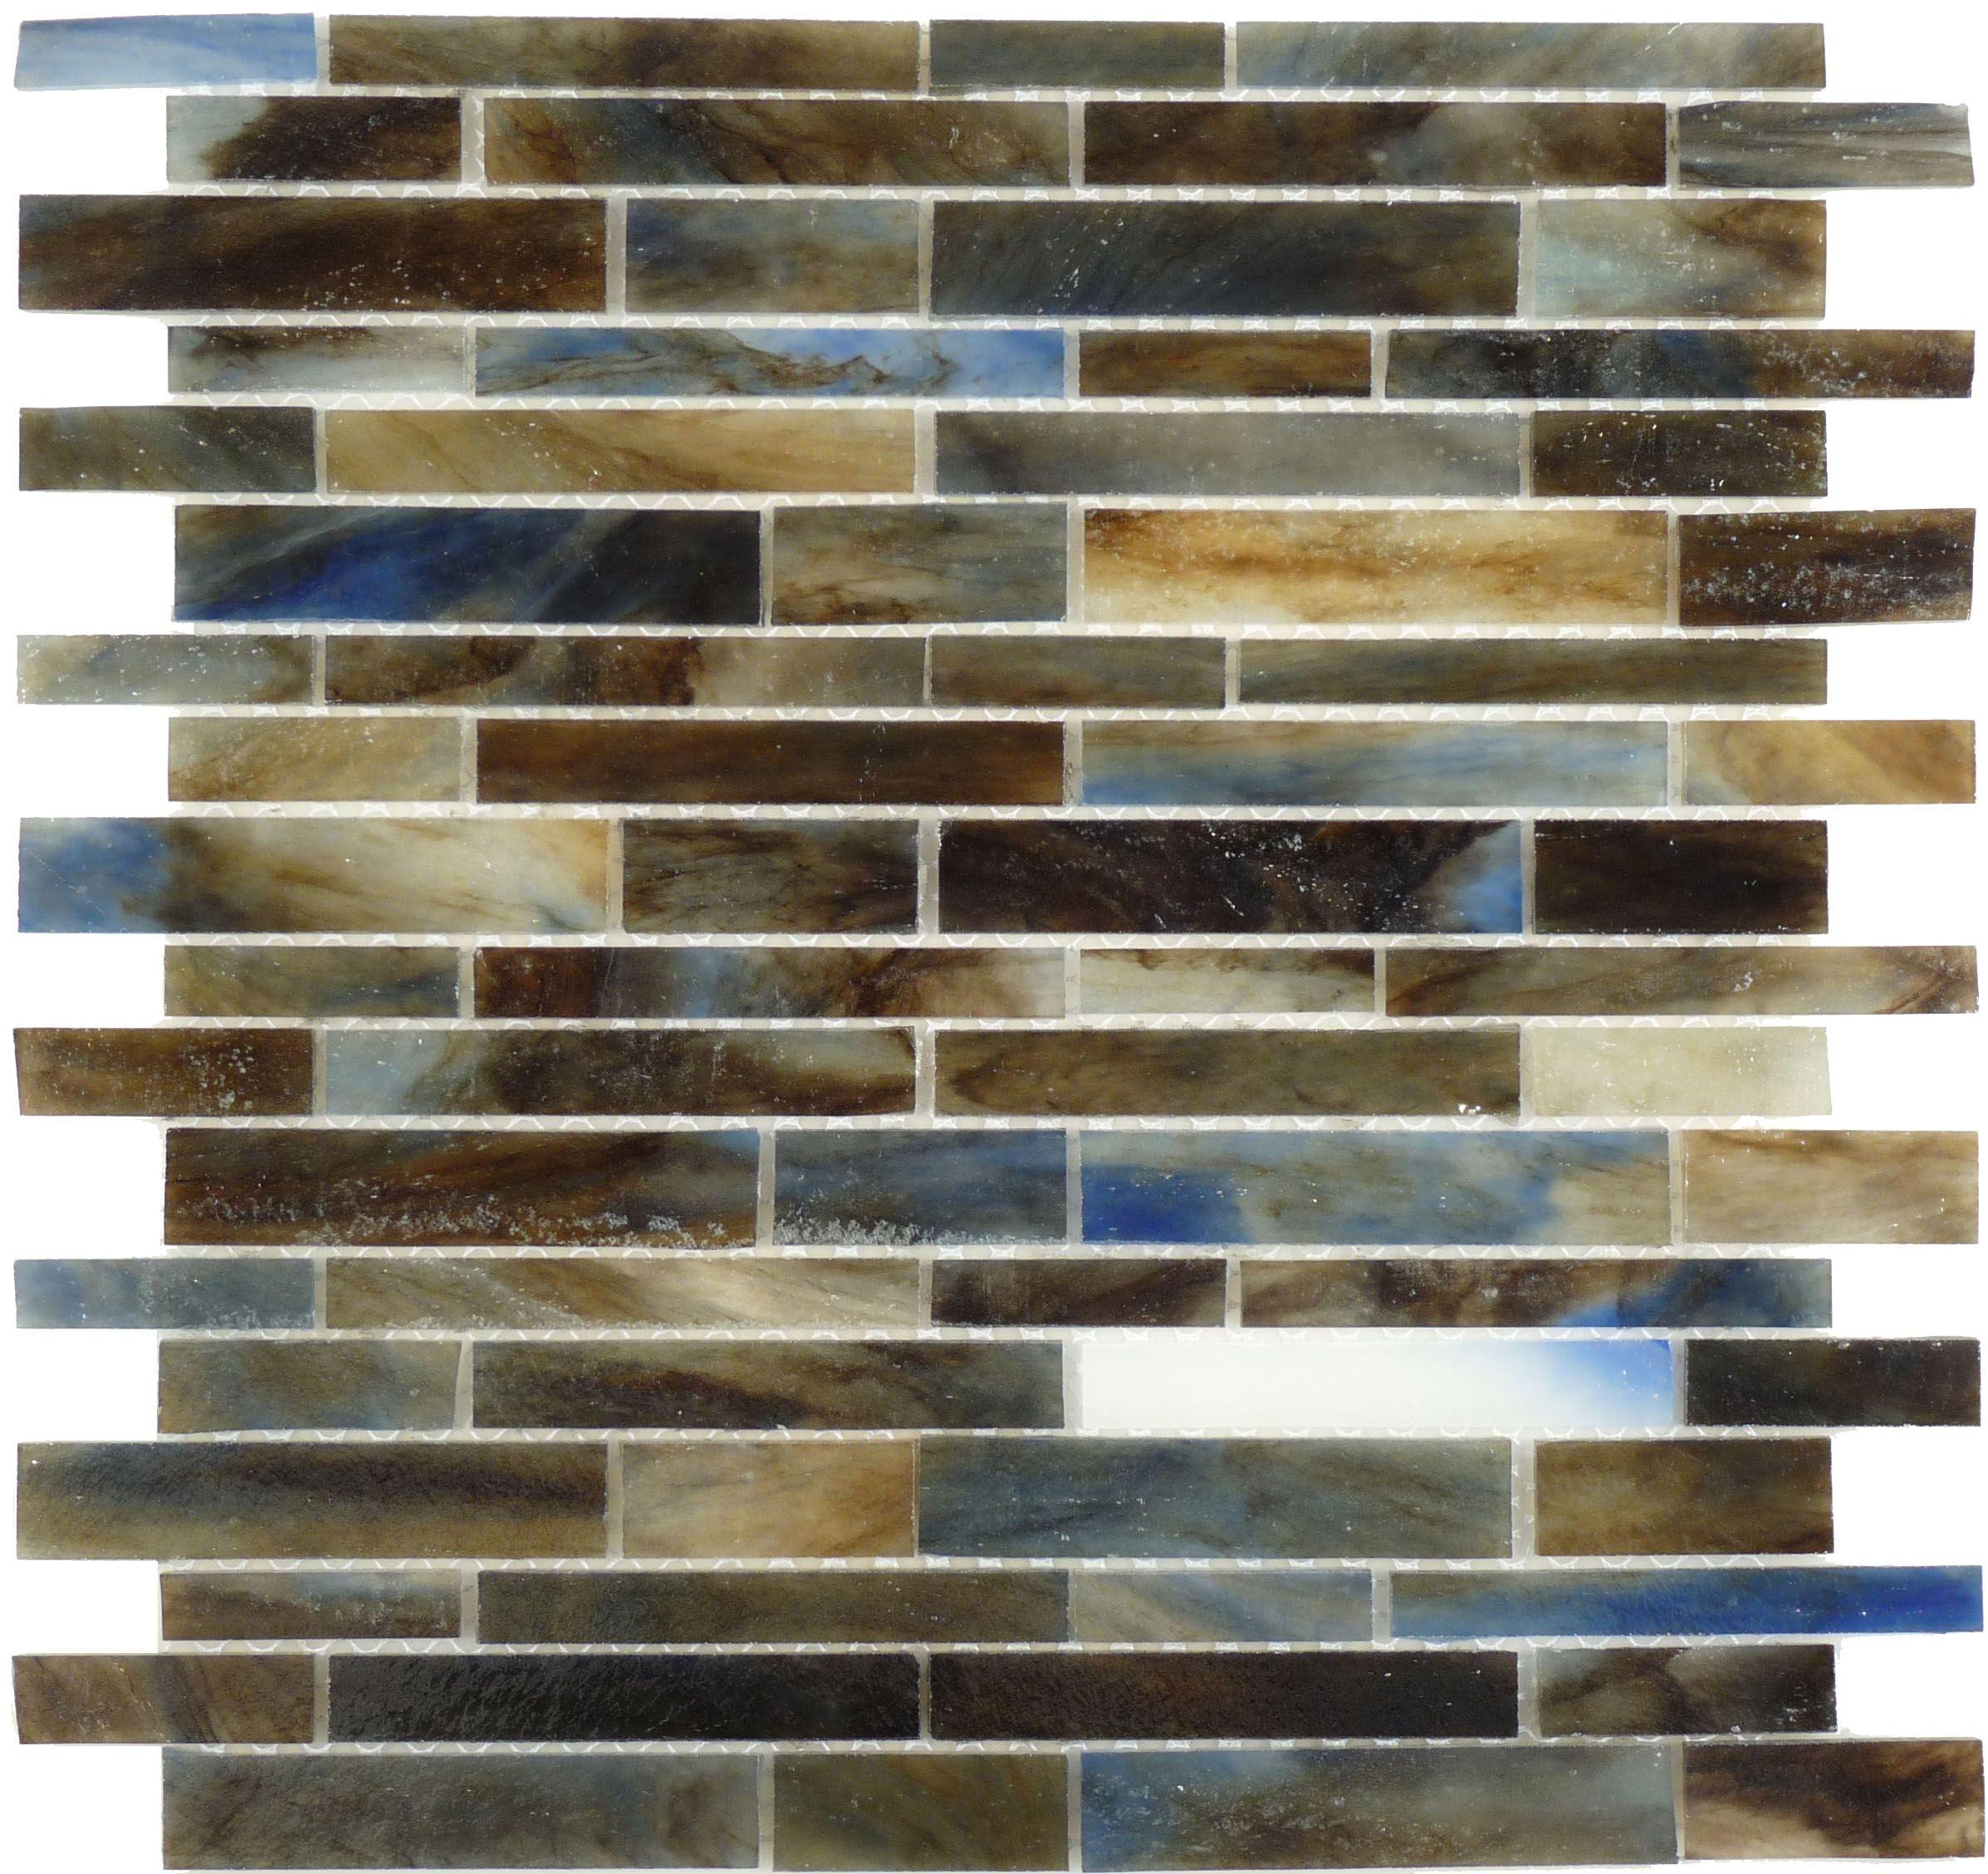 Botanical Glass Murano Vena Glass Mosaic Random Bricks